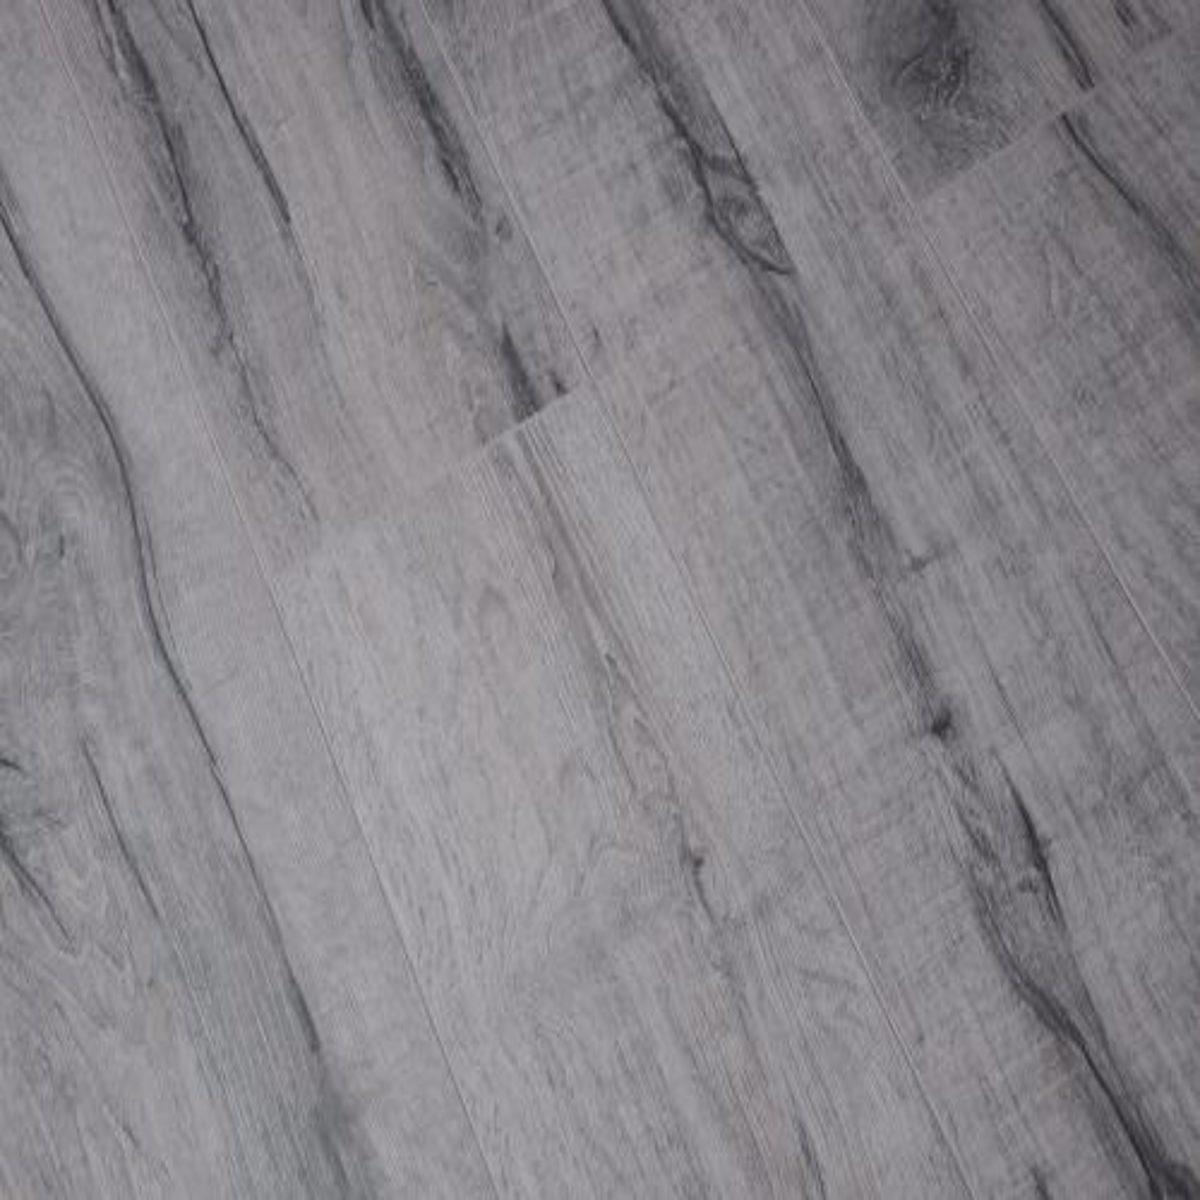 Toucan TF6008 Embossed Laminate Flooring (12mm x 1215 x 195)